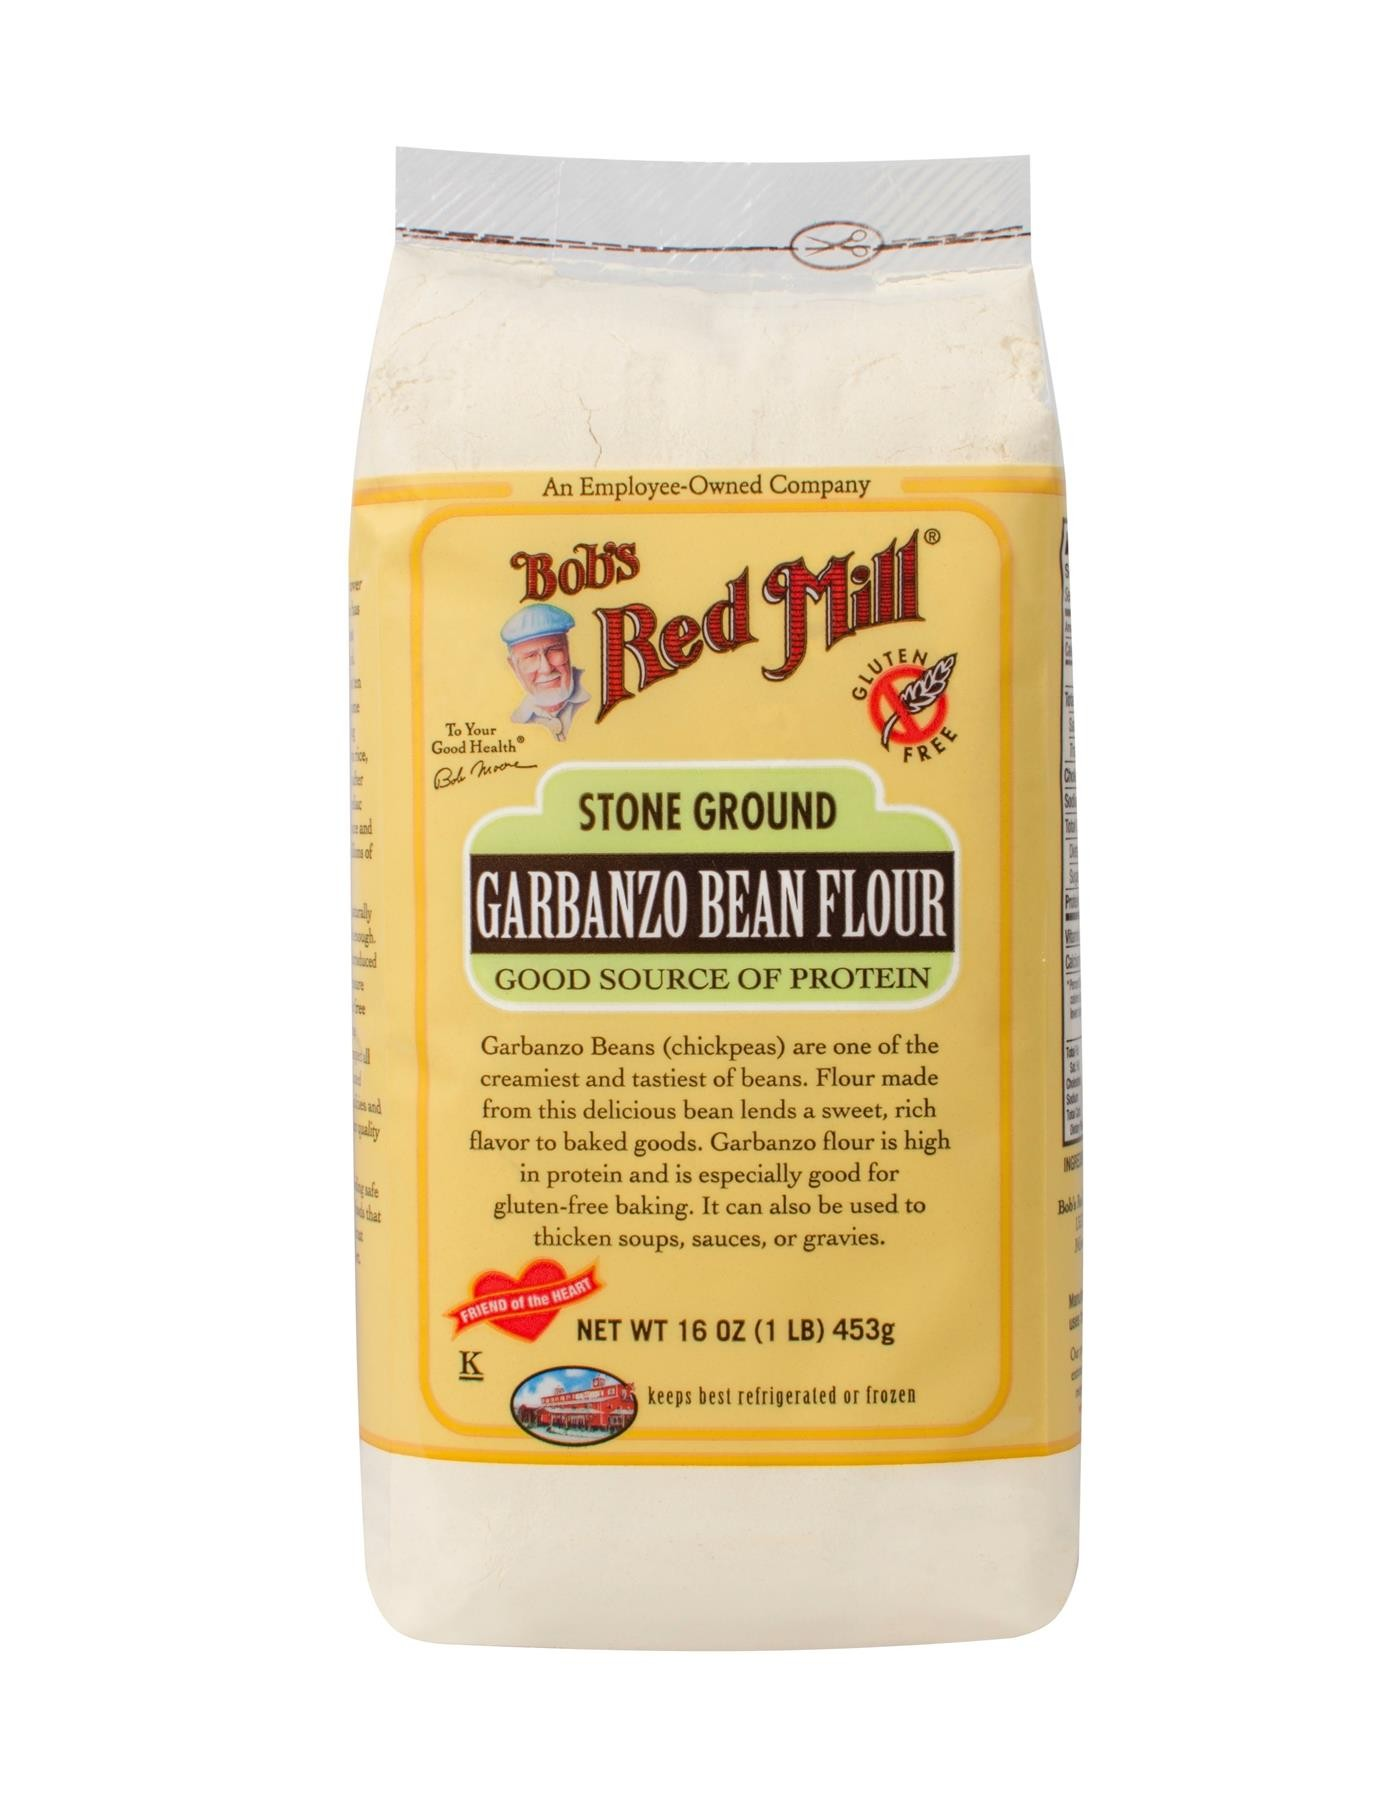 Bob's Red Mill Gluten Free Garbanzo Bean Flour 4/16oz ... | 1374 x 1799 jpeg 144kB